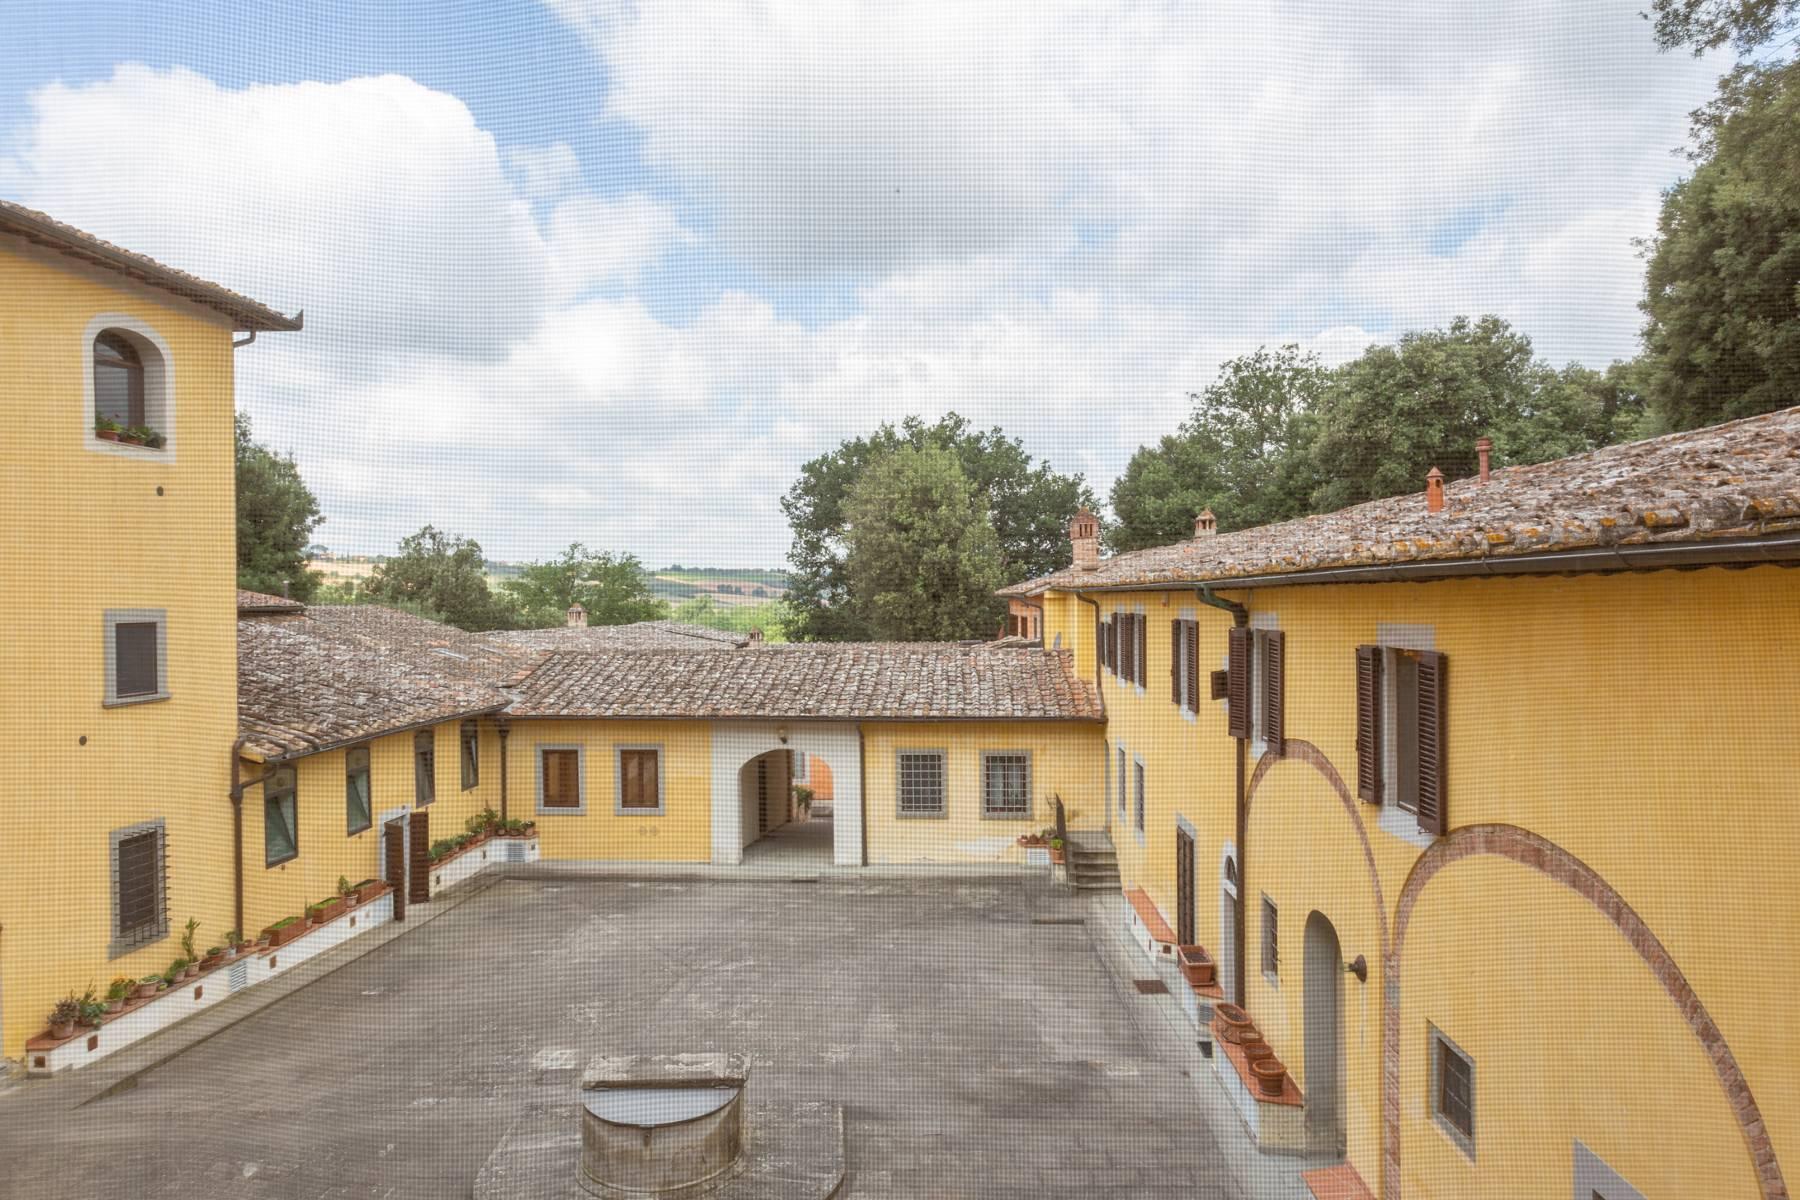 Appartamento in Vendita a Scandicci: 5 locali, 140 mq - Foto 20